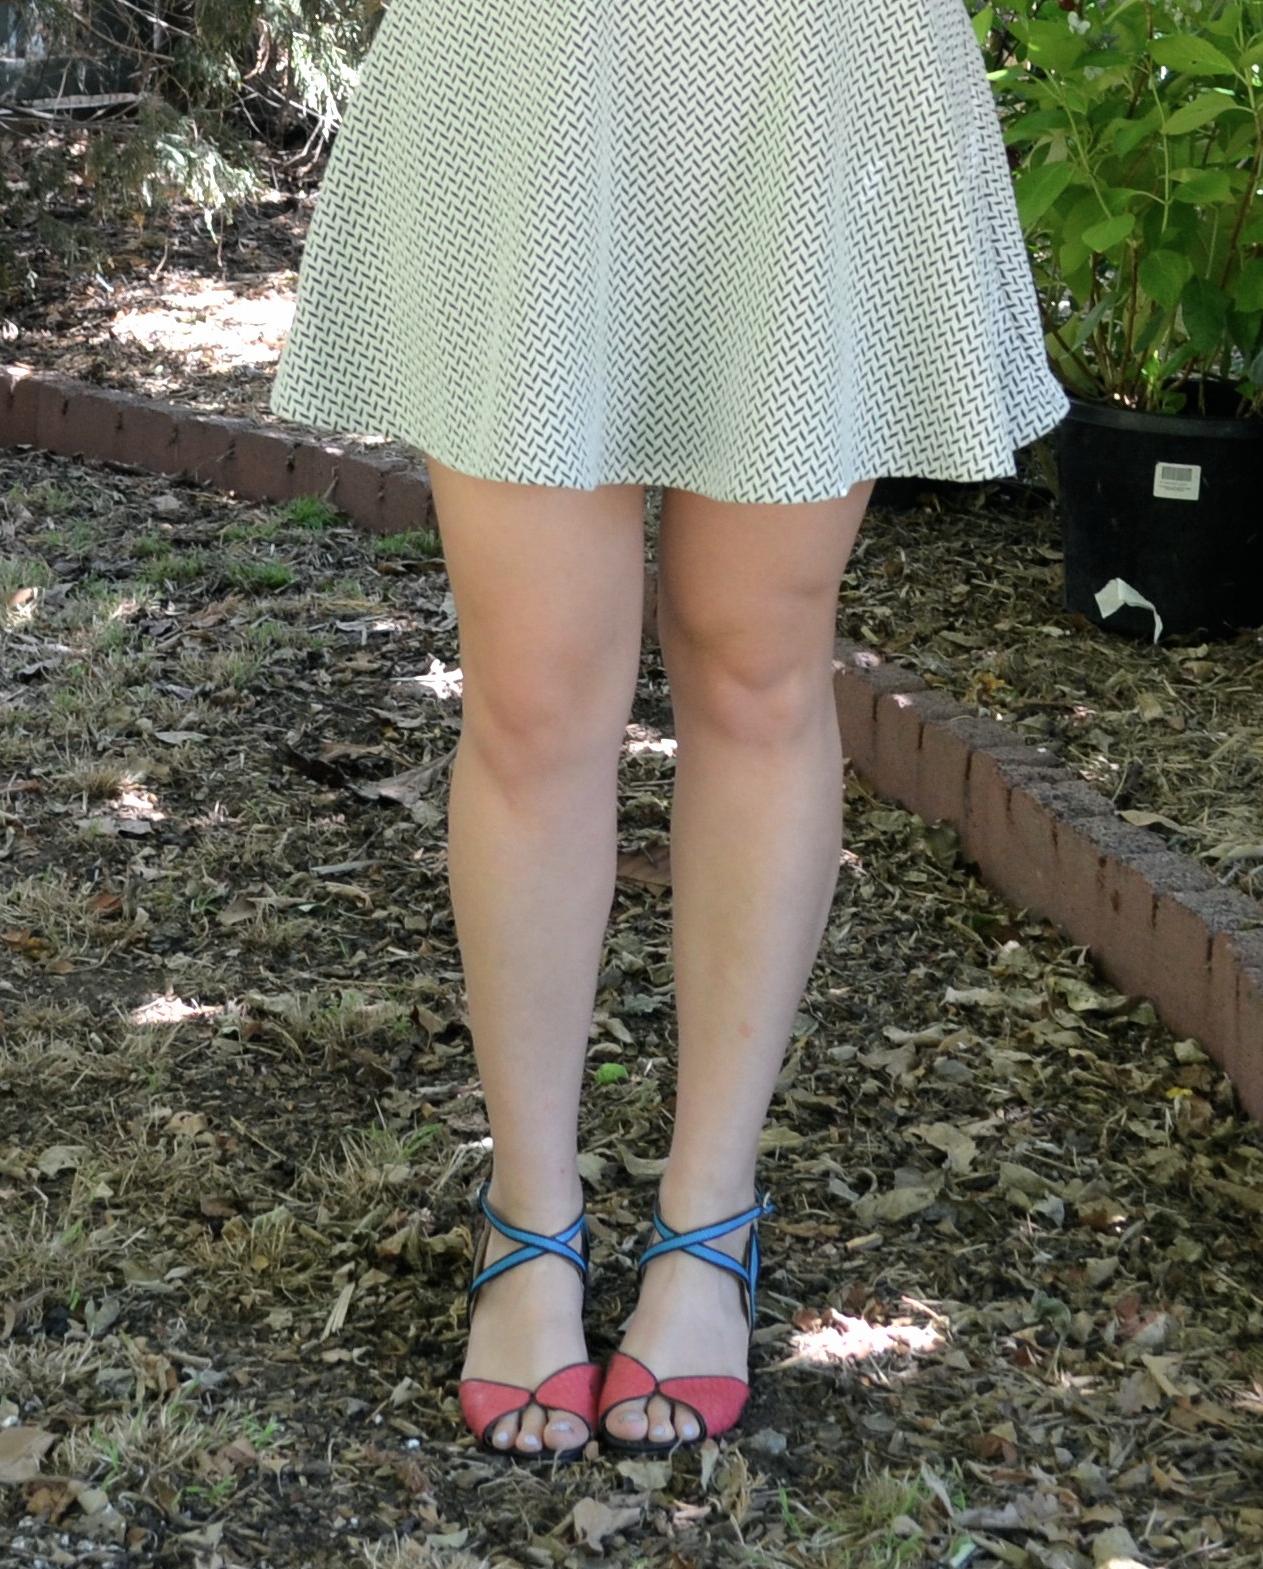 skater-skirt-red-blue-shoes-modcloth